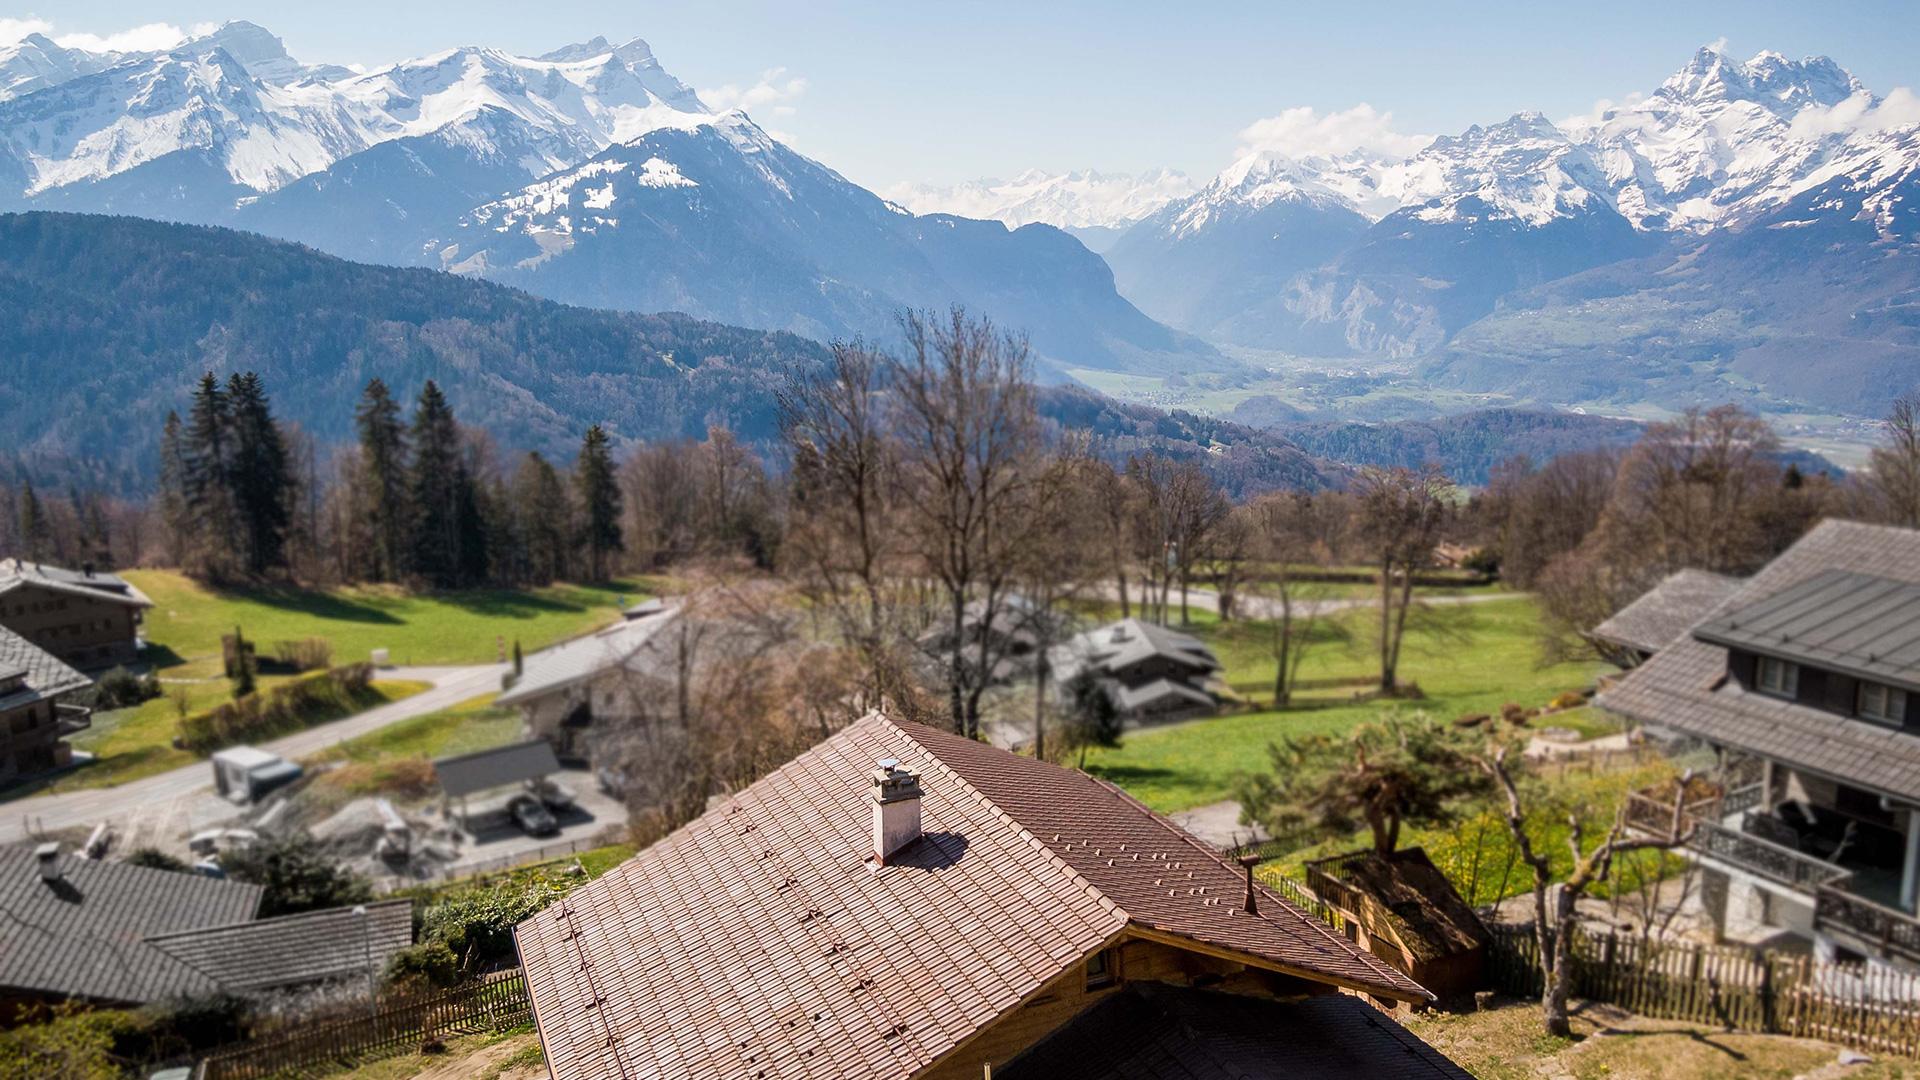 Domino Chalet, Switzerland